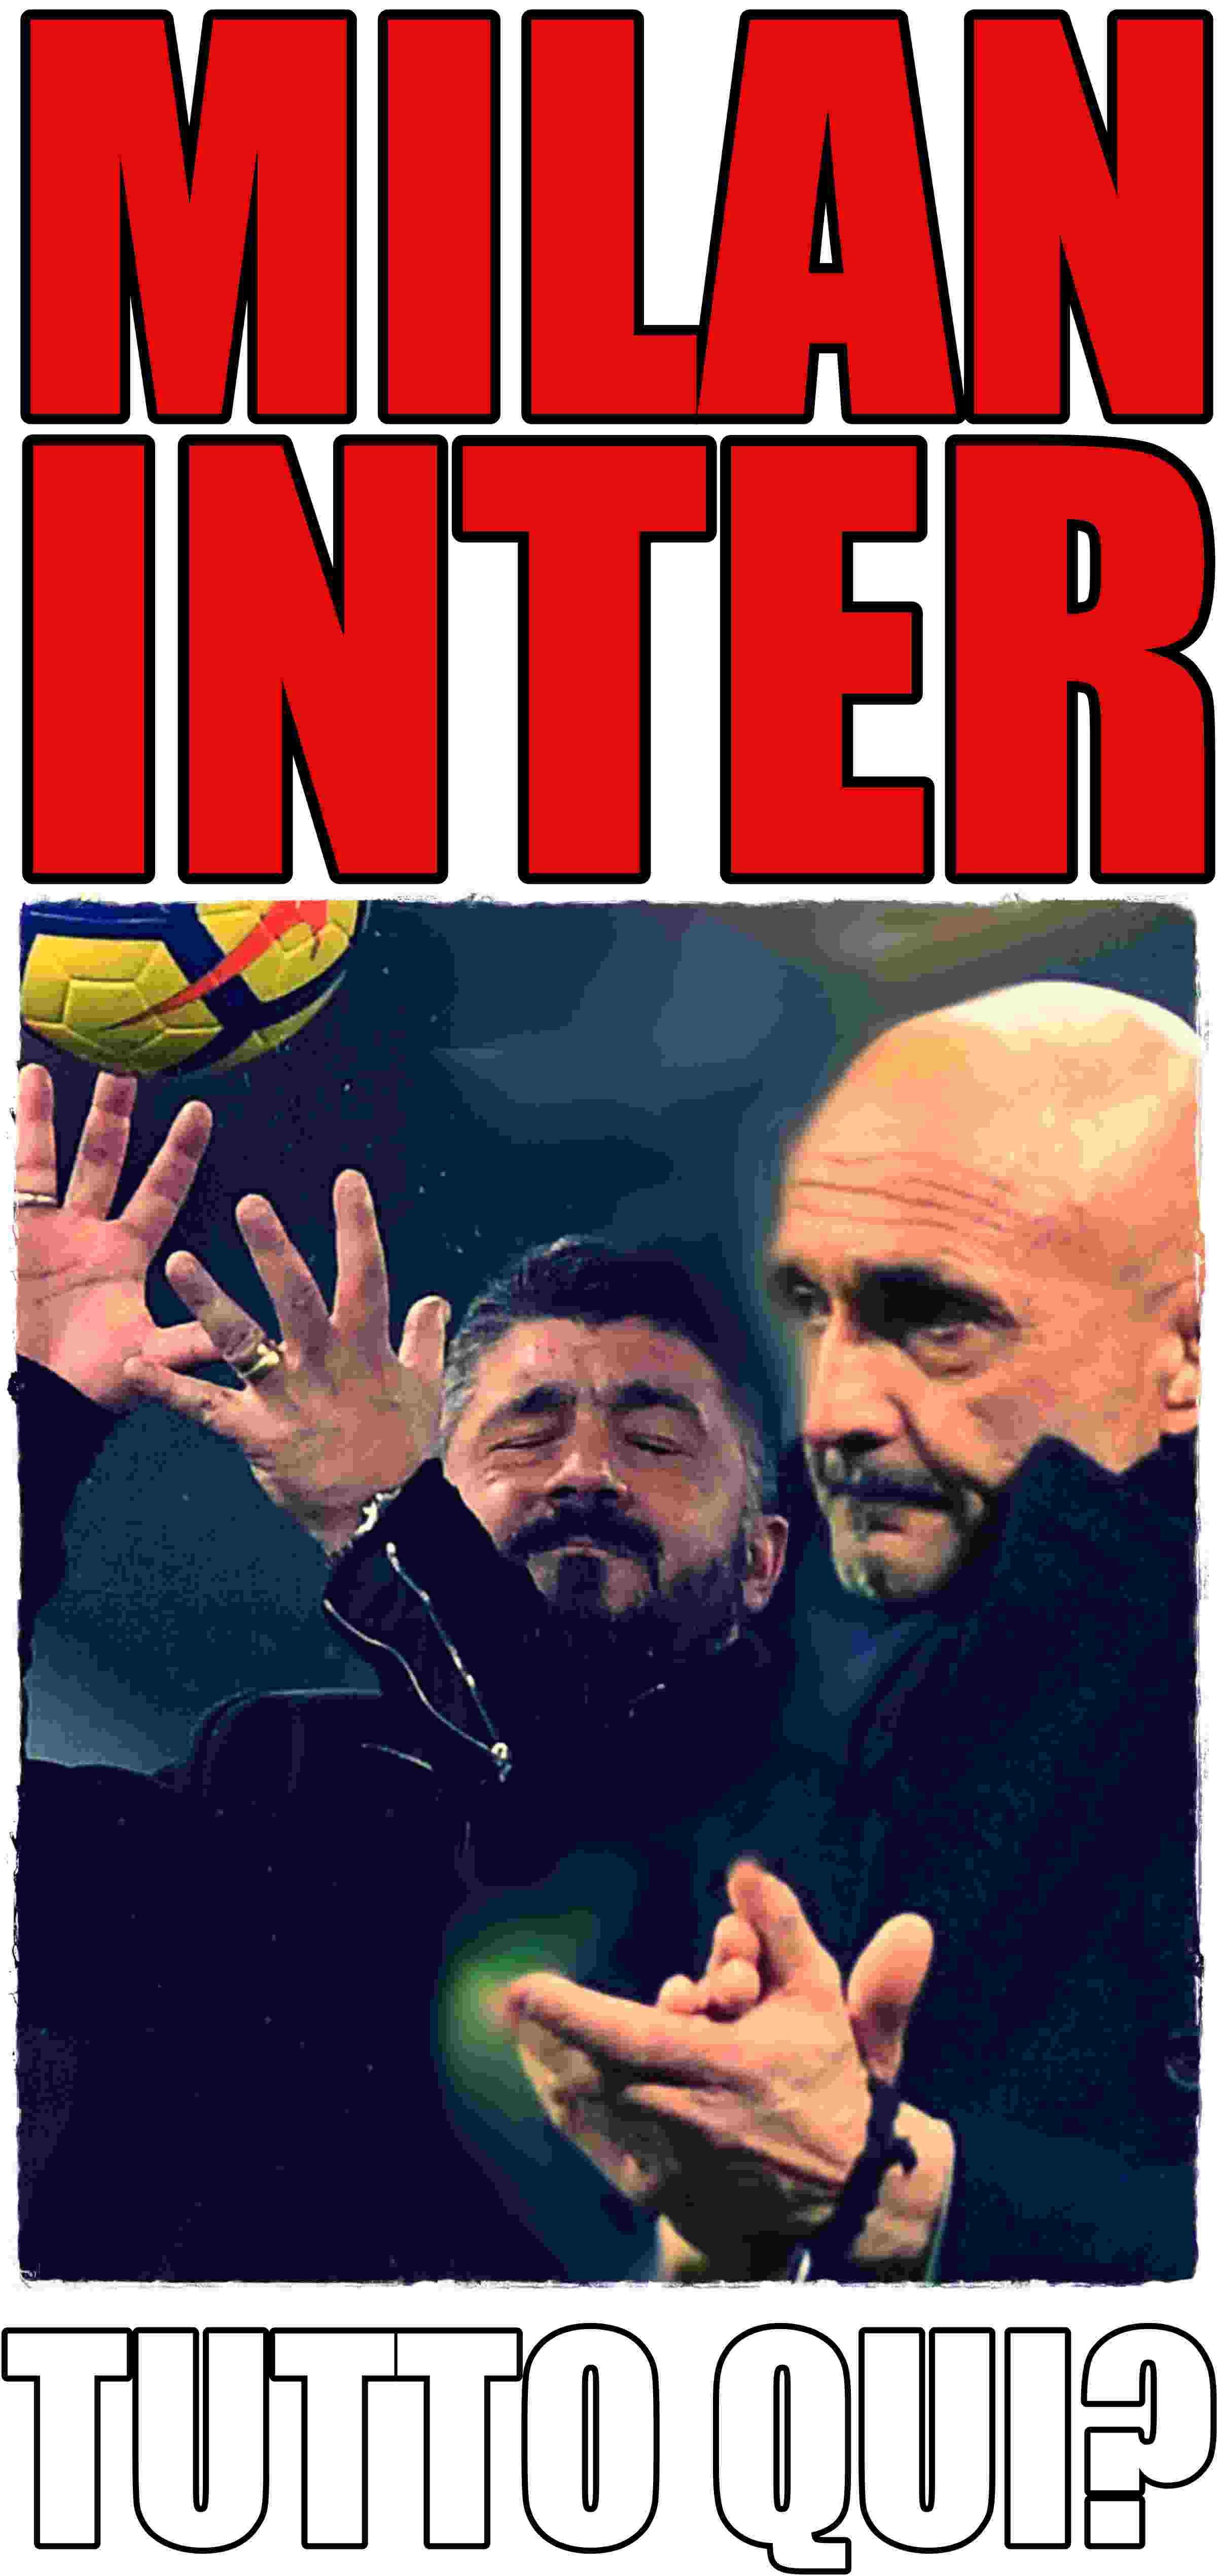 Gattuso Spalletti 2